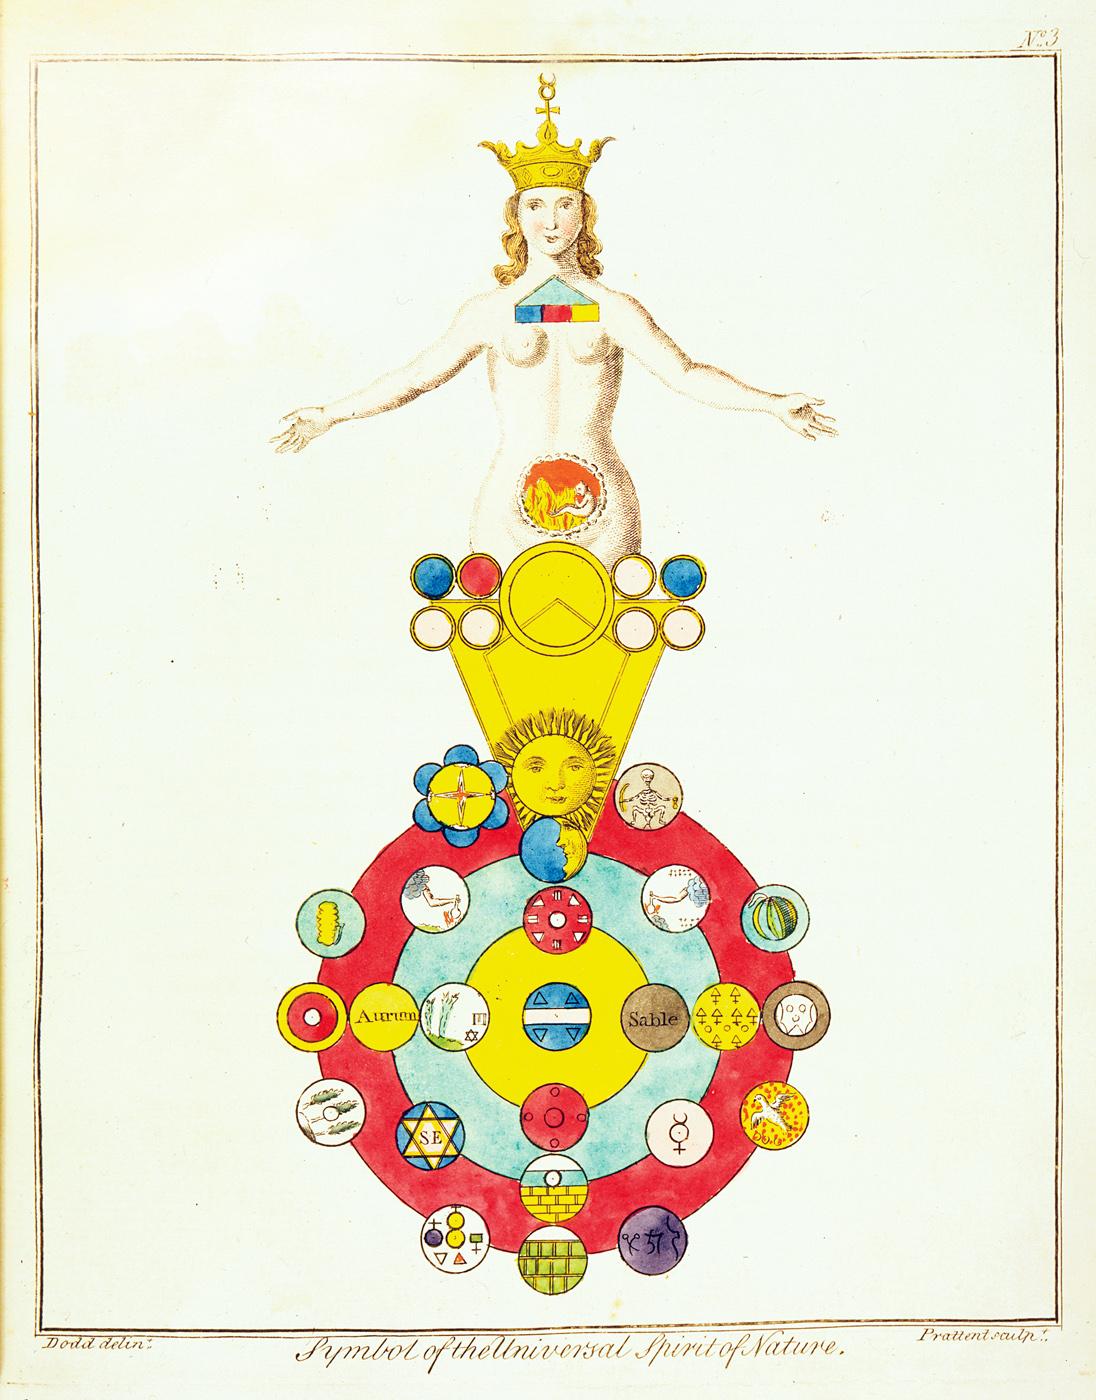 Illustration of the Universal Spirit of Nature, c. 1798.